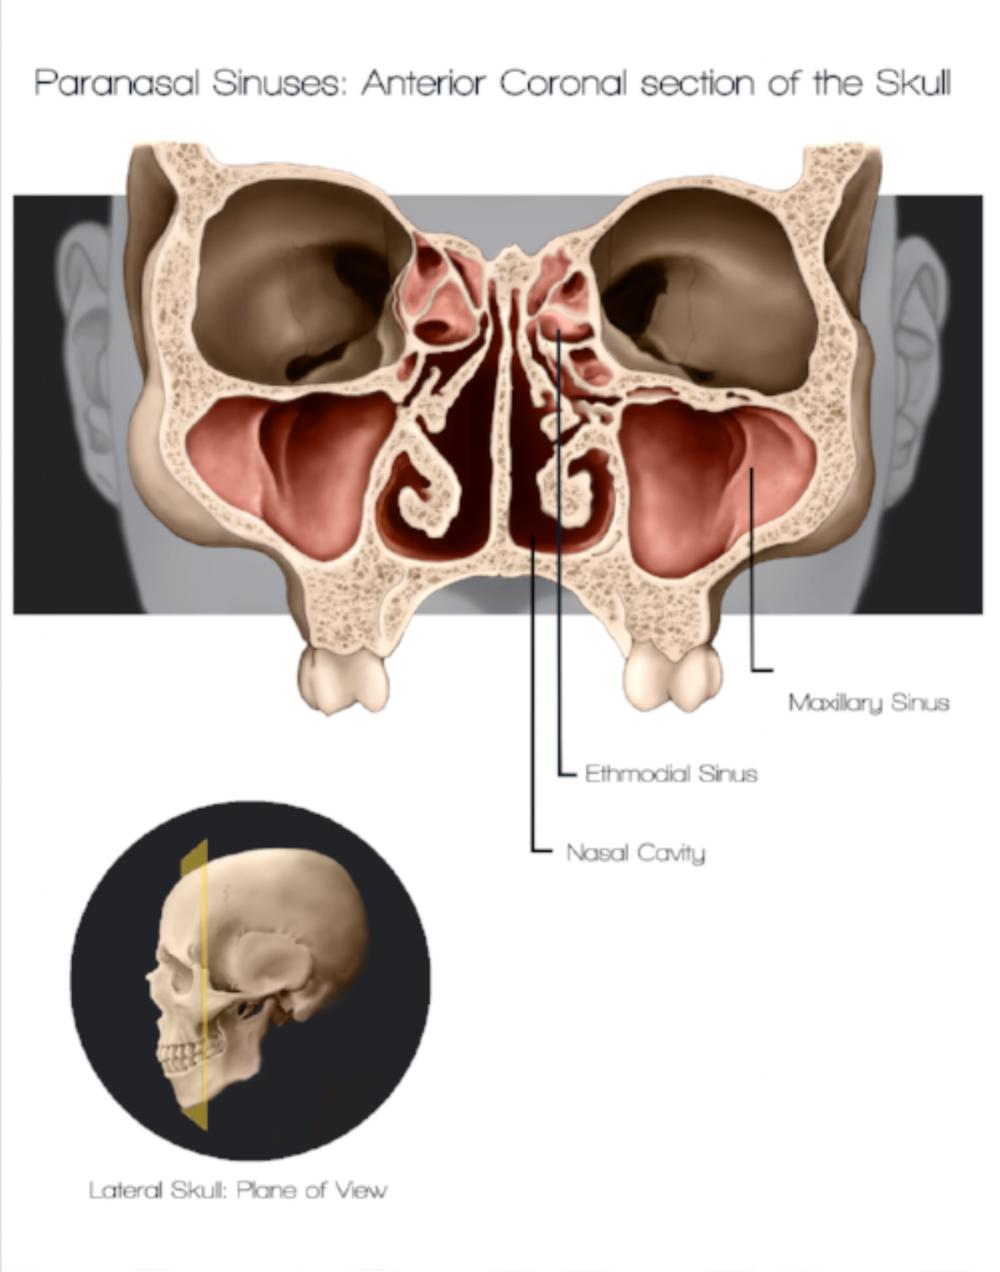 Groß Anatomy Of The Paranasal Sinuses Galerie - Anatomie Ideen ...